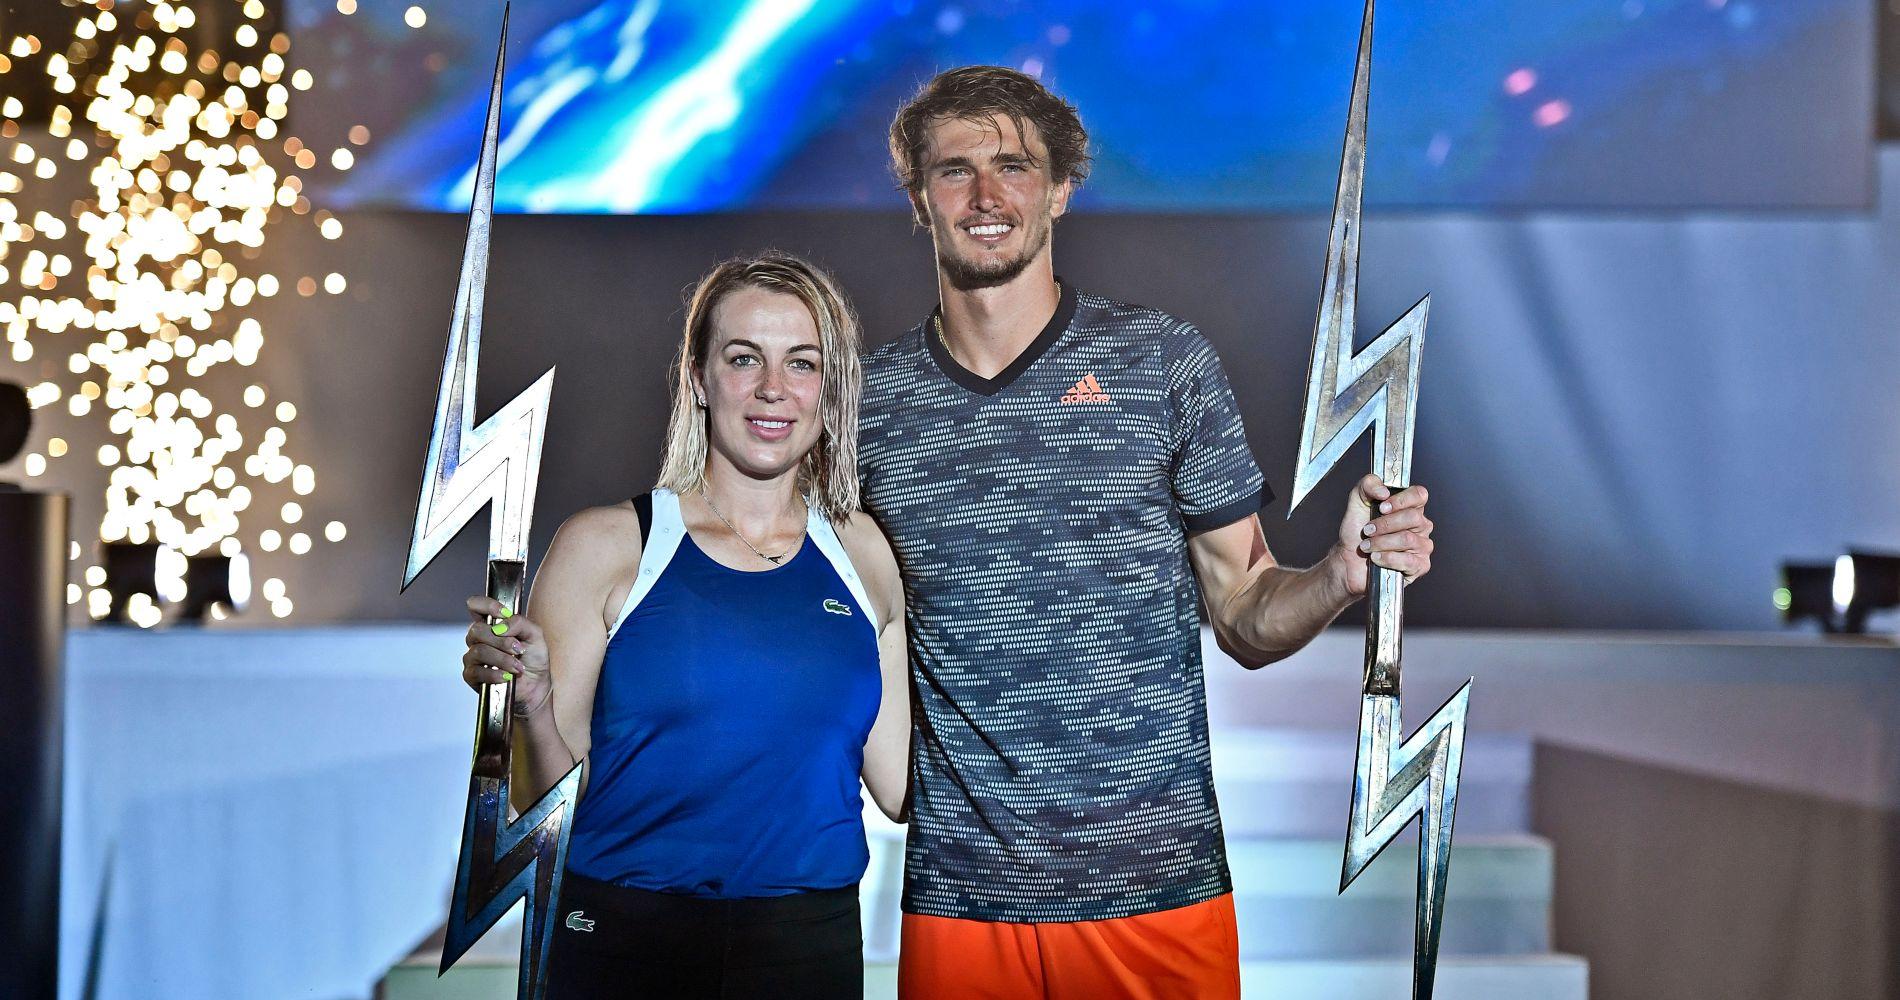 Les vainqueurs de l'UTS 2 : Anastasia Pavlyuchenkova et Alexander Zverev